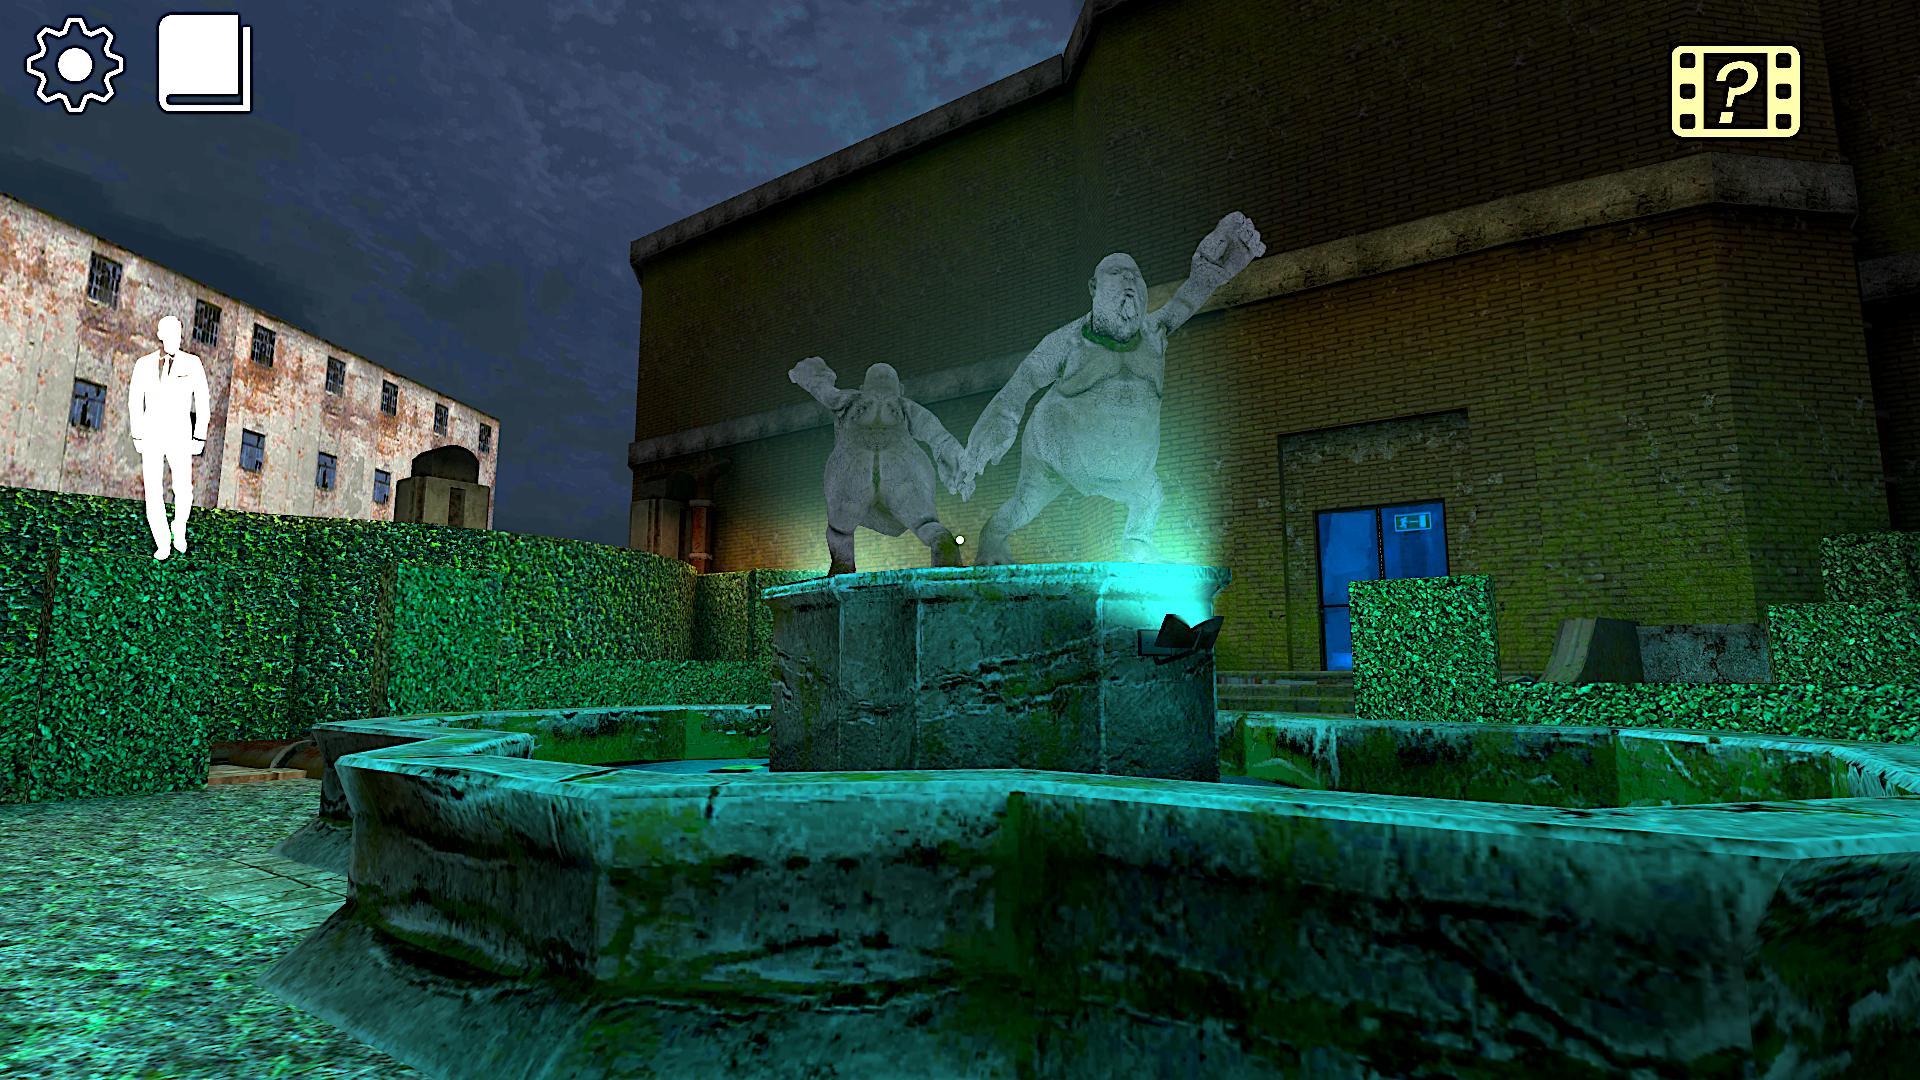 Evil Erich Sann : The New Horror Games. 2.5.0 Screenshot 1